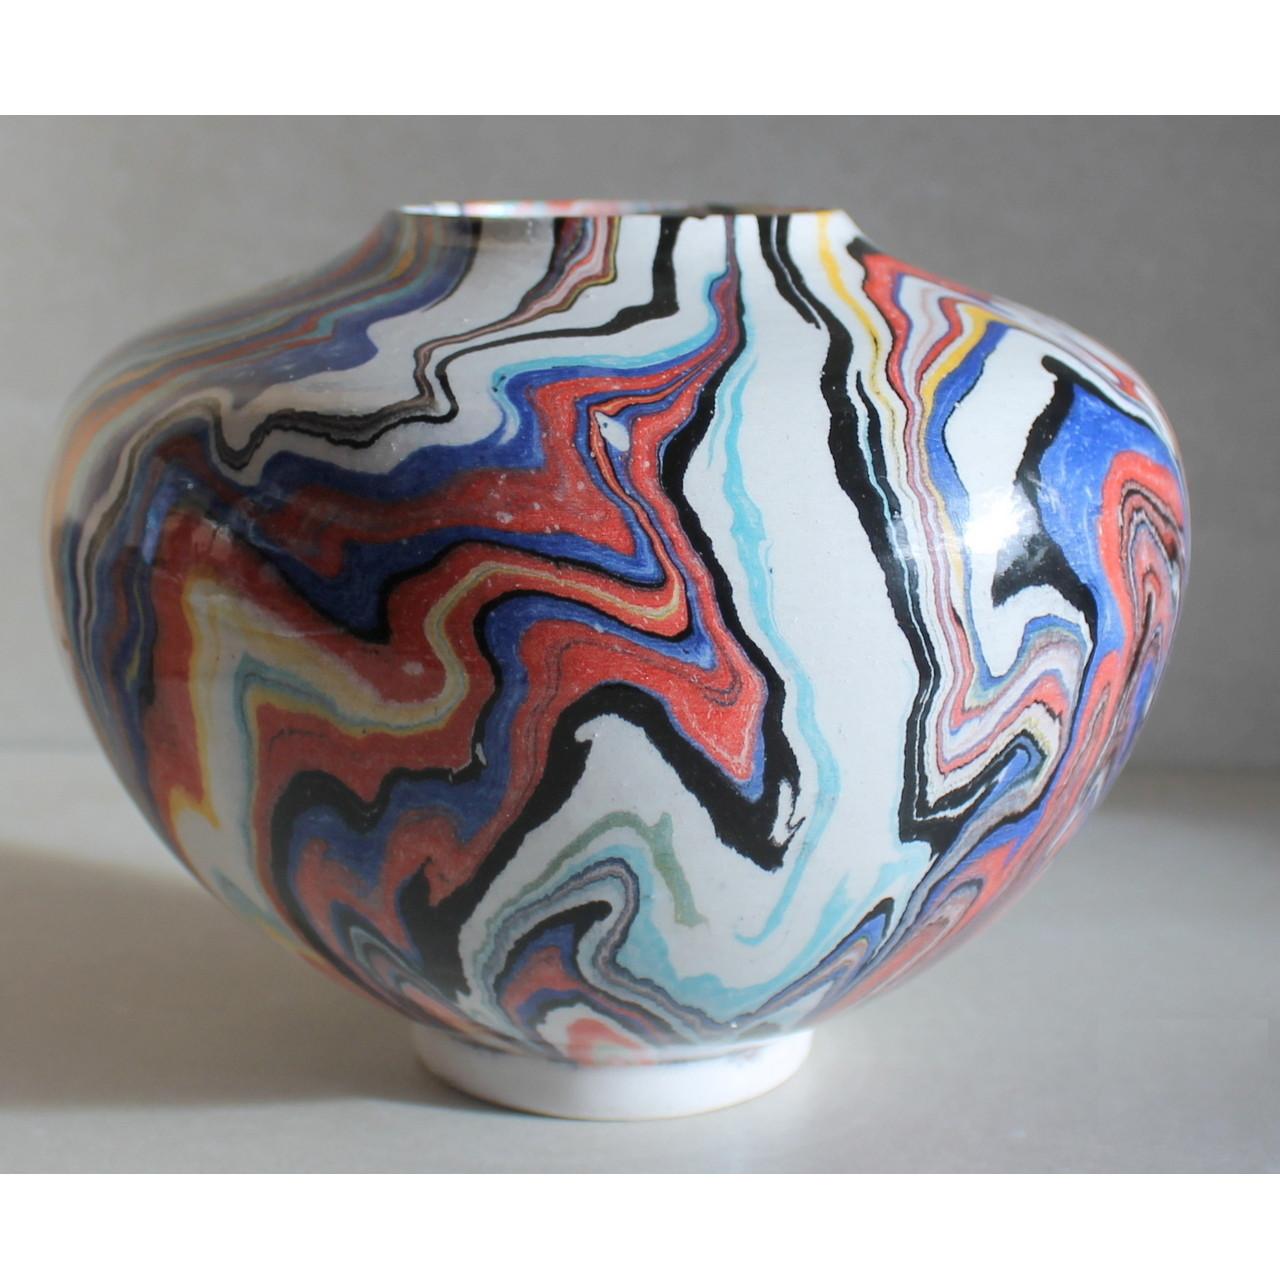 lenox china vase of bahir vase vases amp bowls t within mgctlbxnmz mgctlbxv5 1 17 mgctlbxlt mgctlbxpwoocommerce